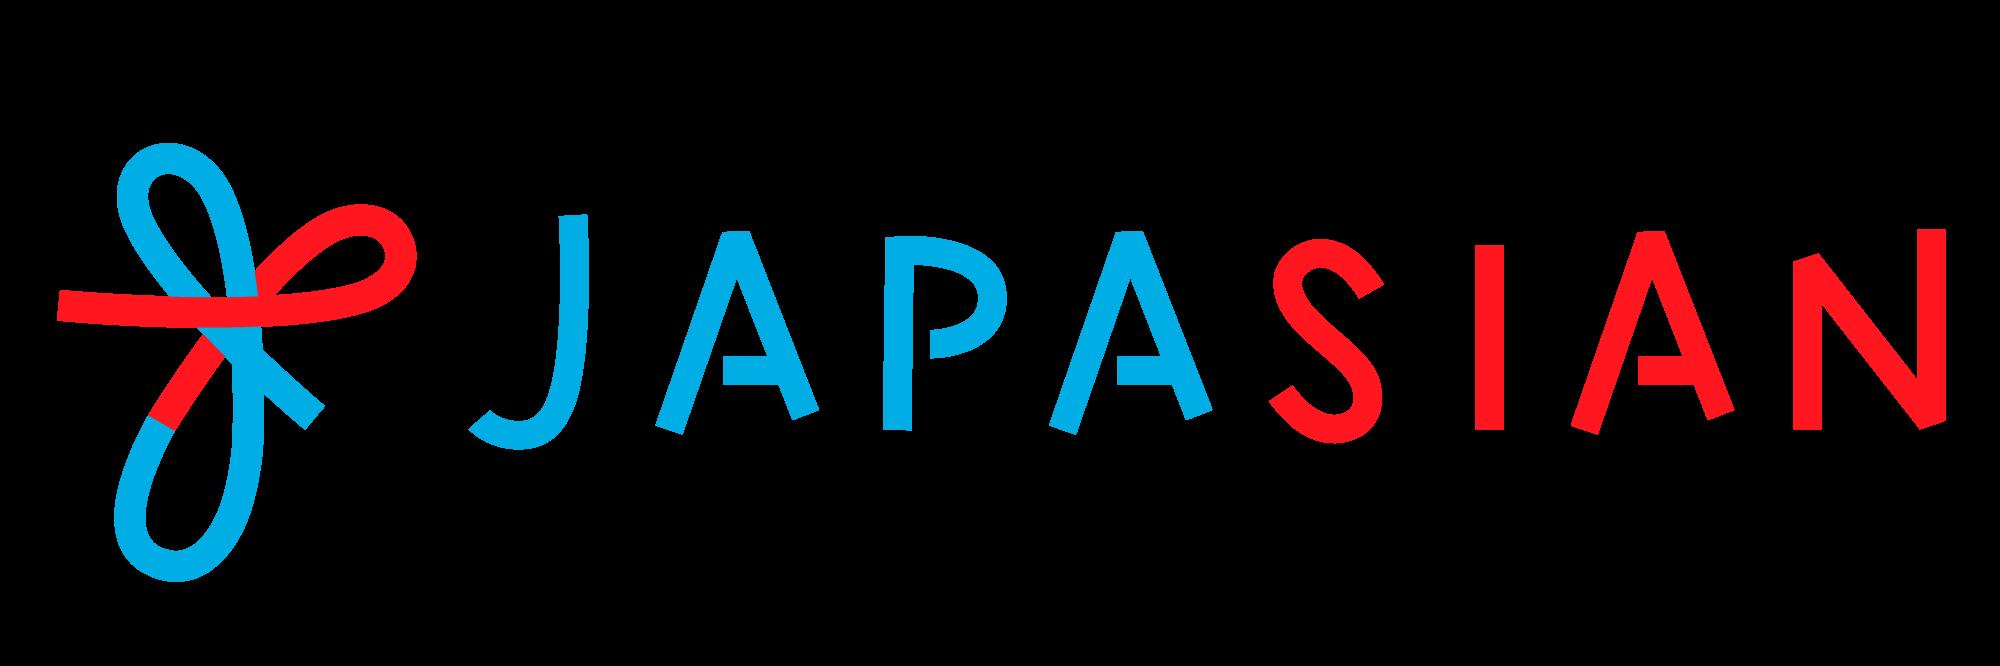 japasian_logo_15